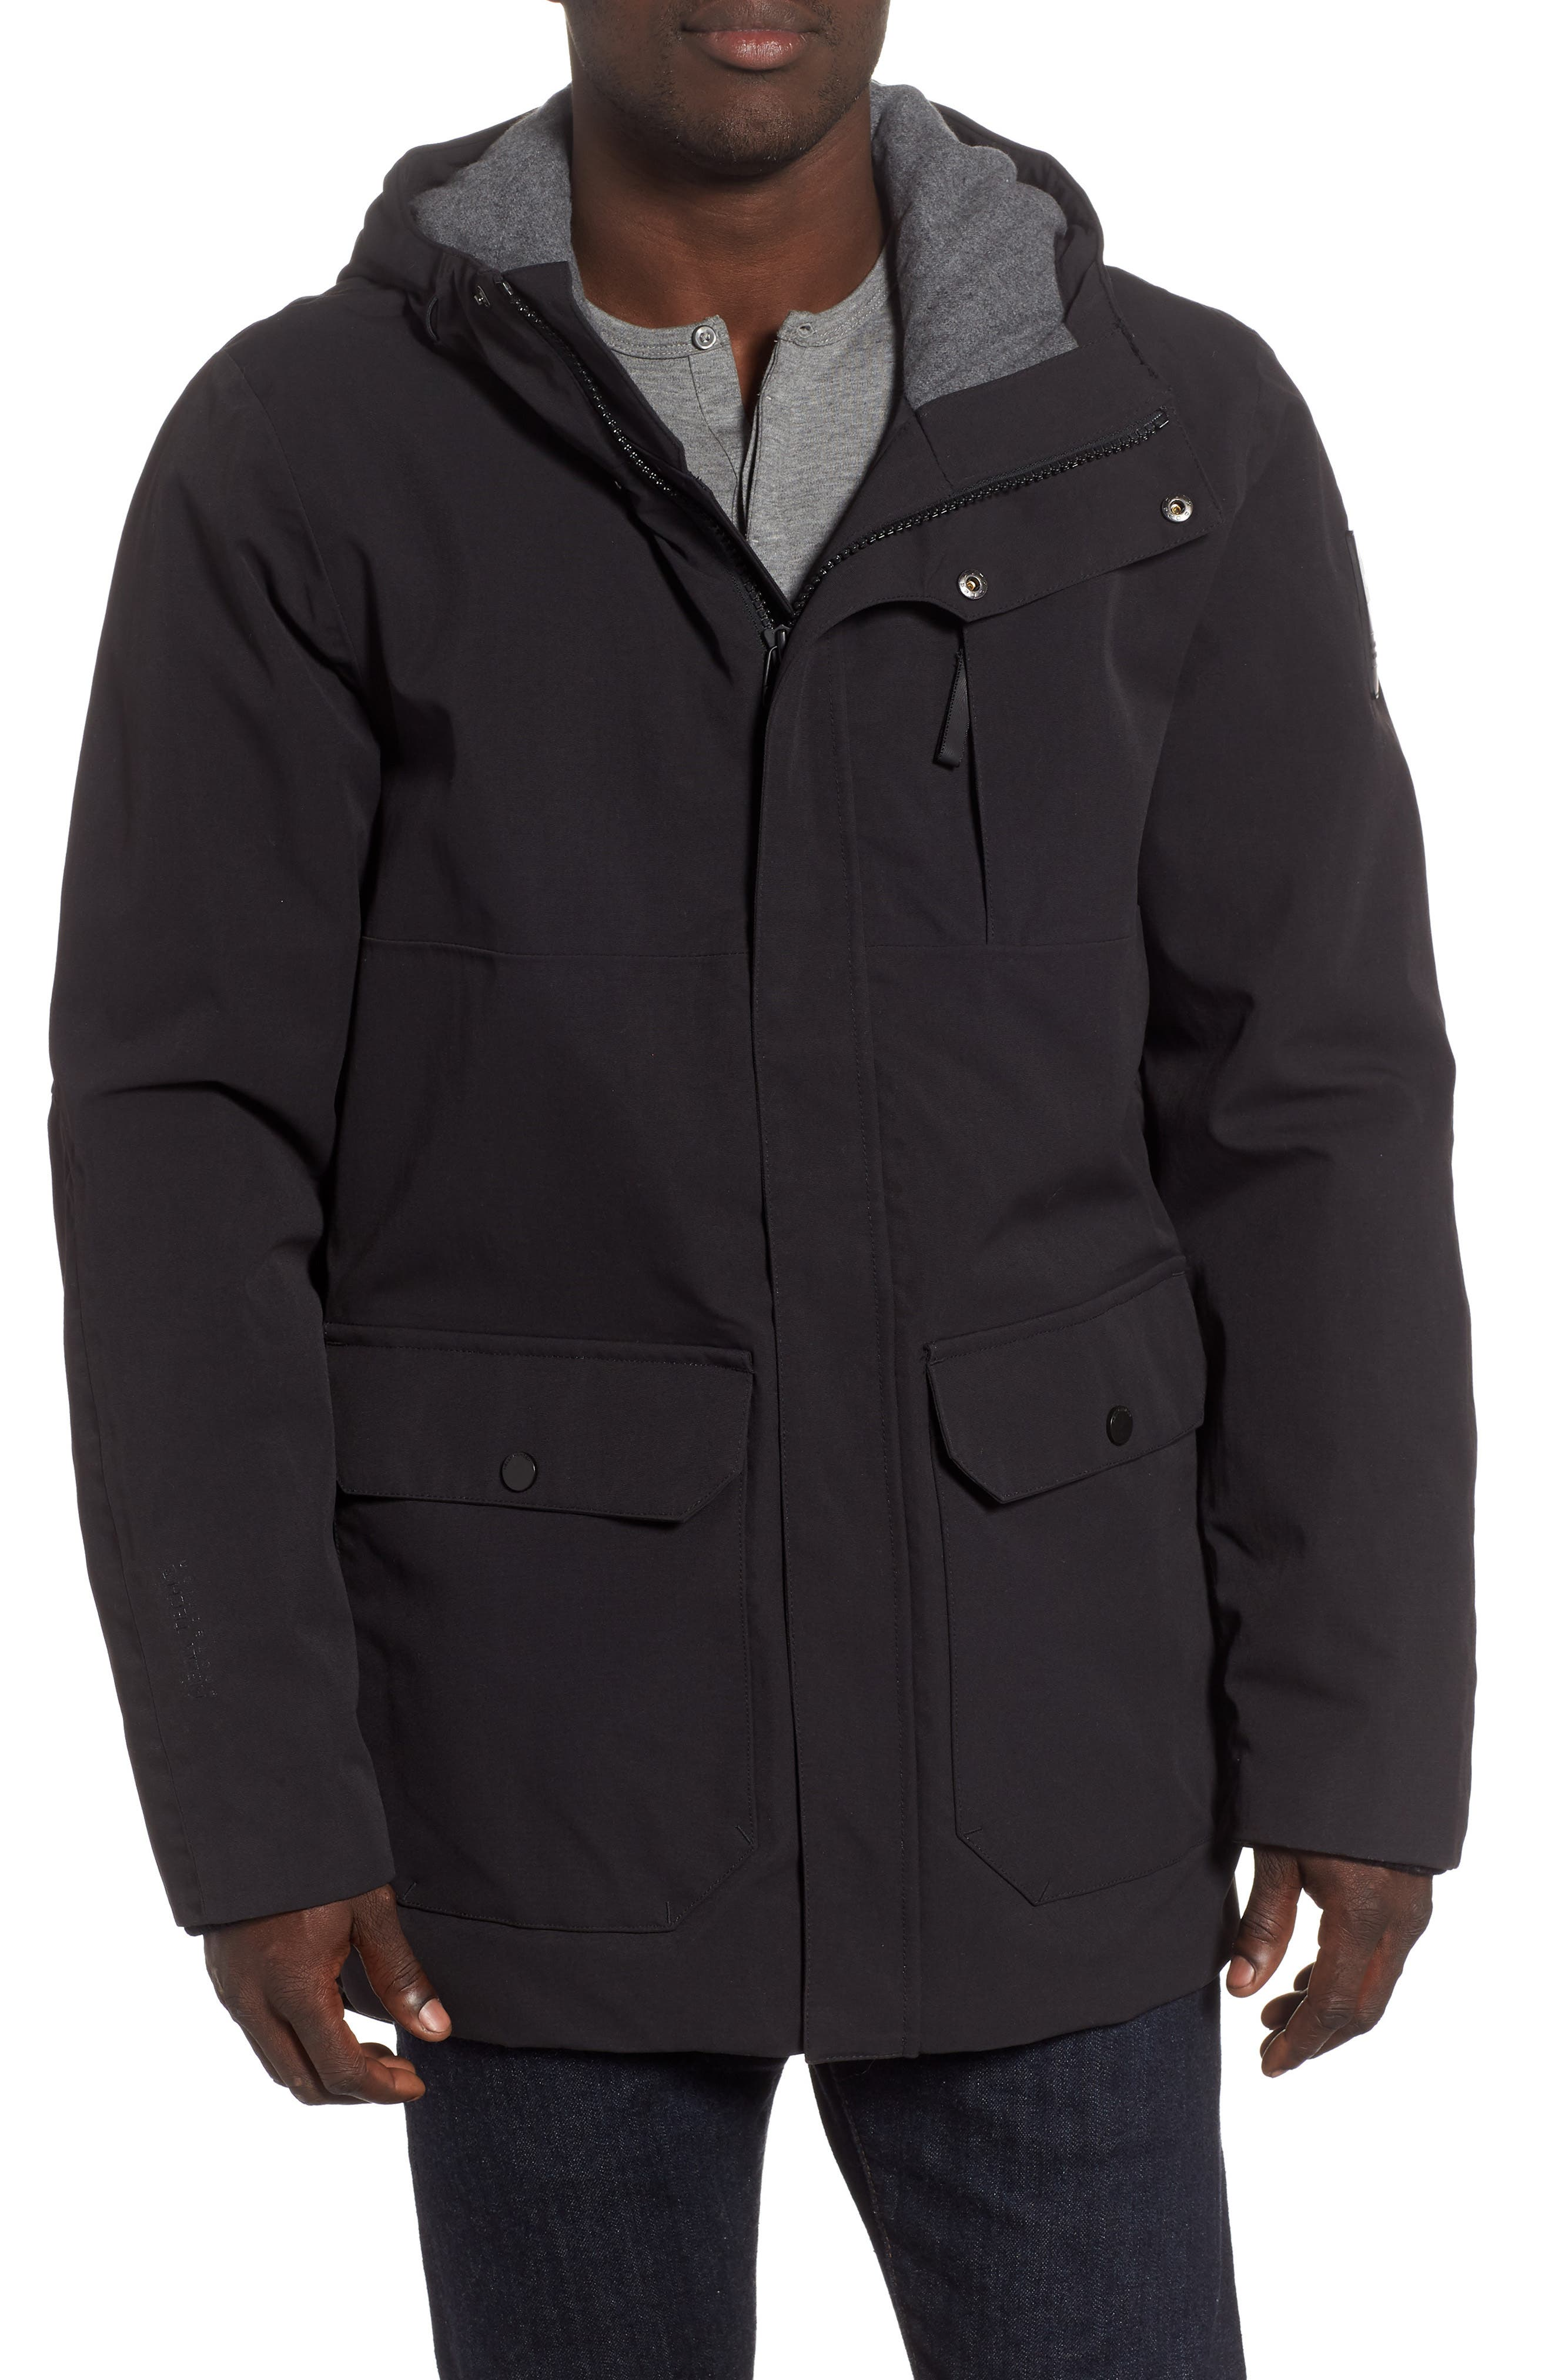 Urban Windproof & Waterproof Primaloft<sup>®</sup> Long Jacket,                             Main thumbnail 1, color,                             BLACK